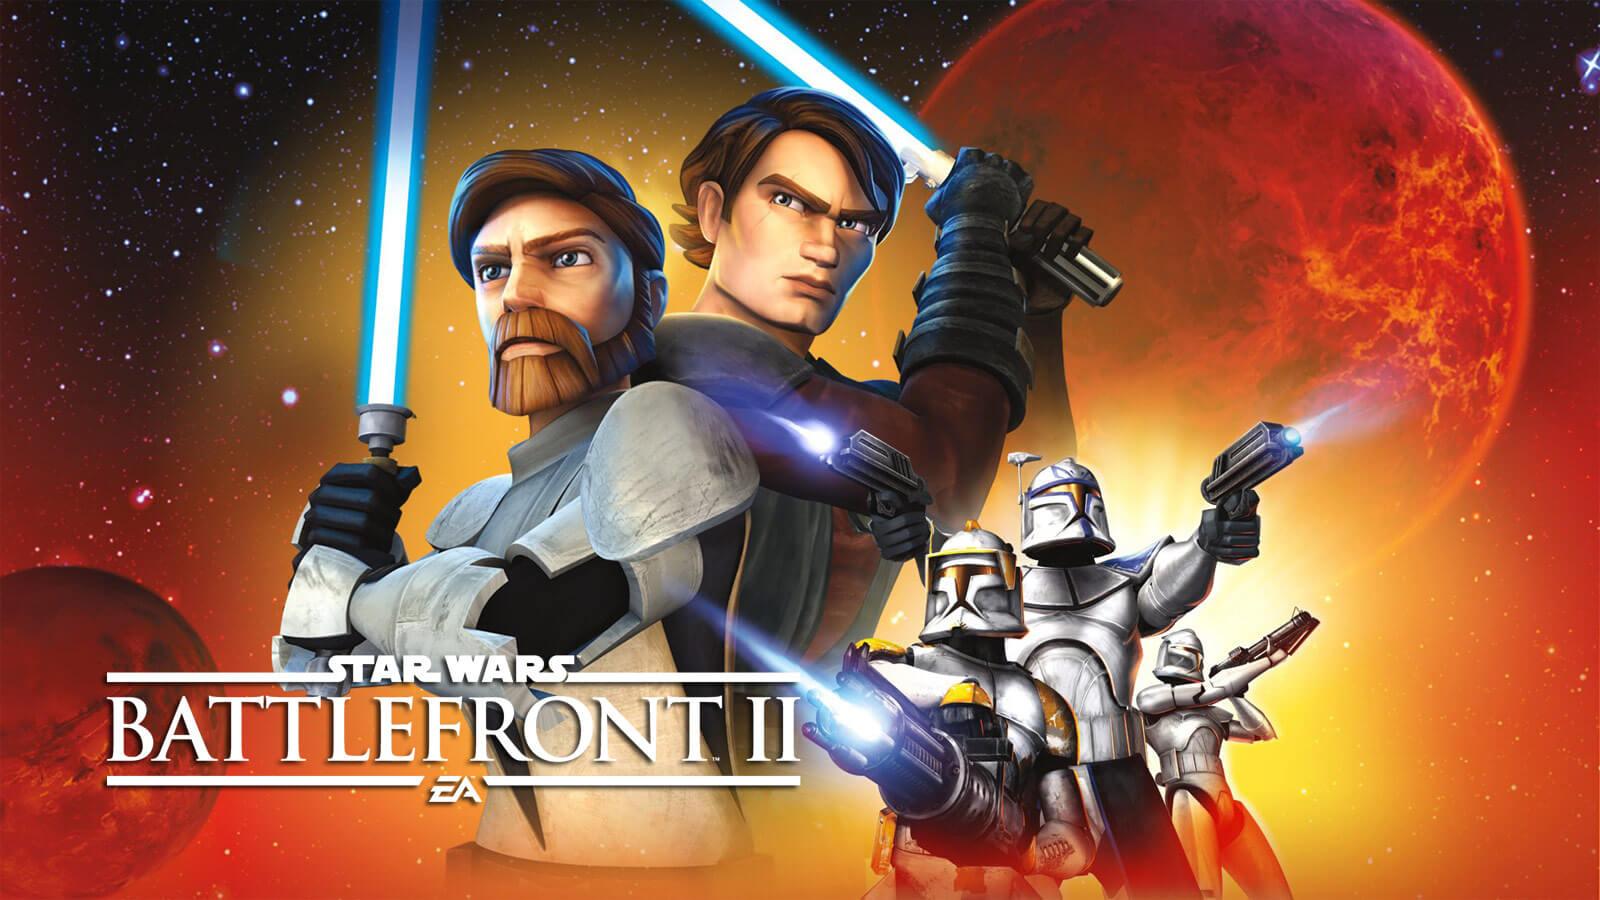 Star Wars: Clone Wars Voice Cast Returns for Battlefront II